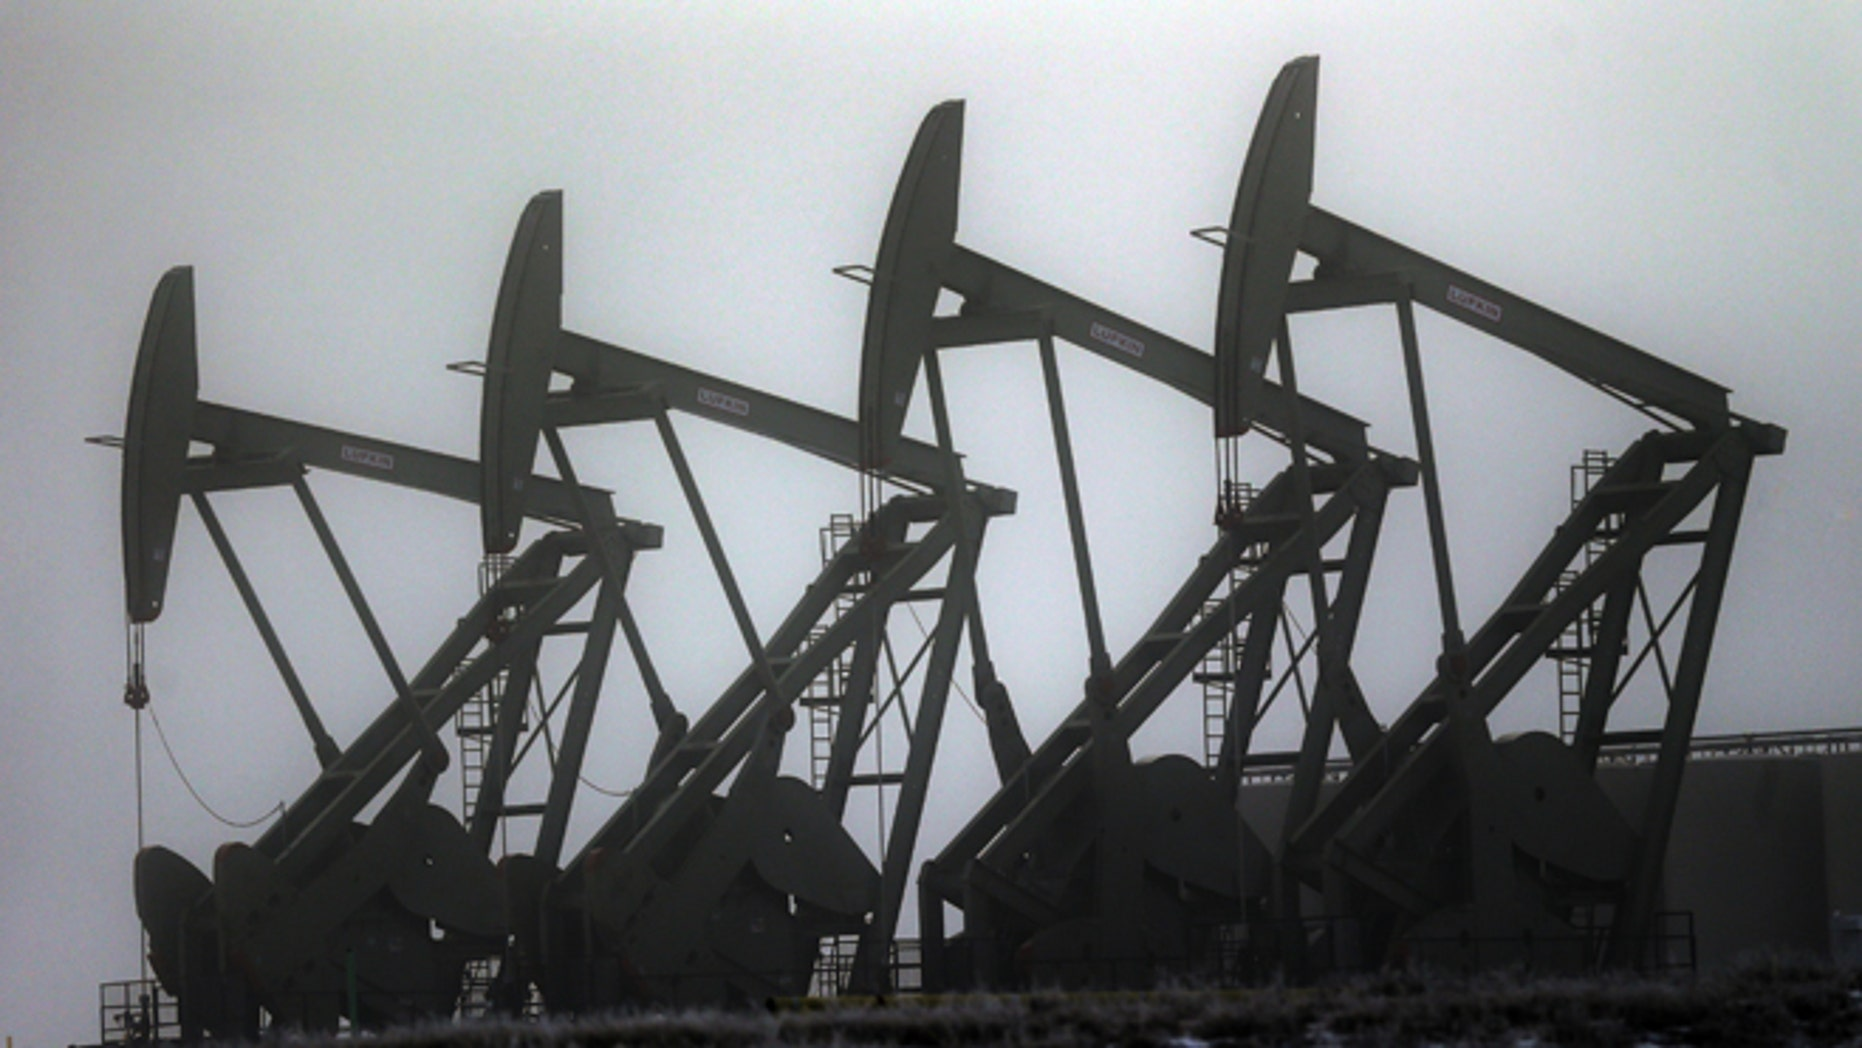 Dec. 19, 2014: Oil pump jacks are shown in Williston, N.D.